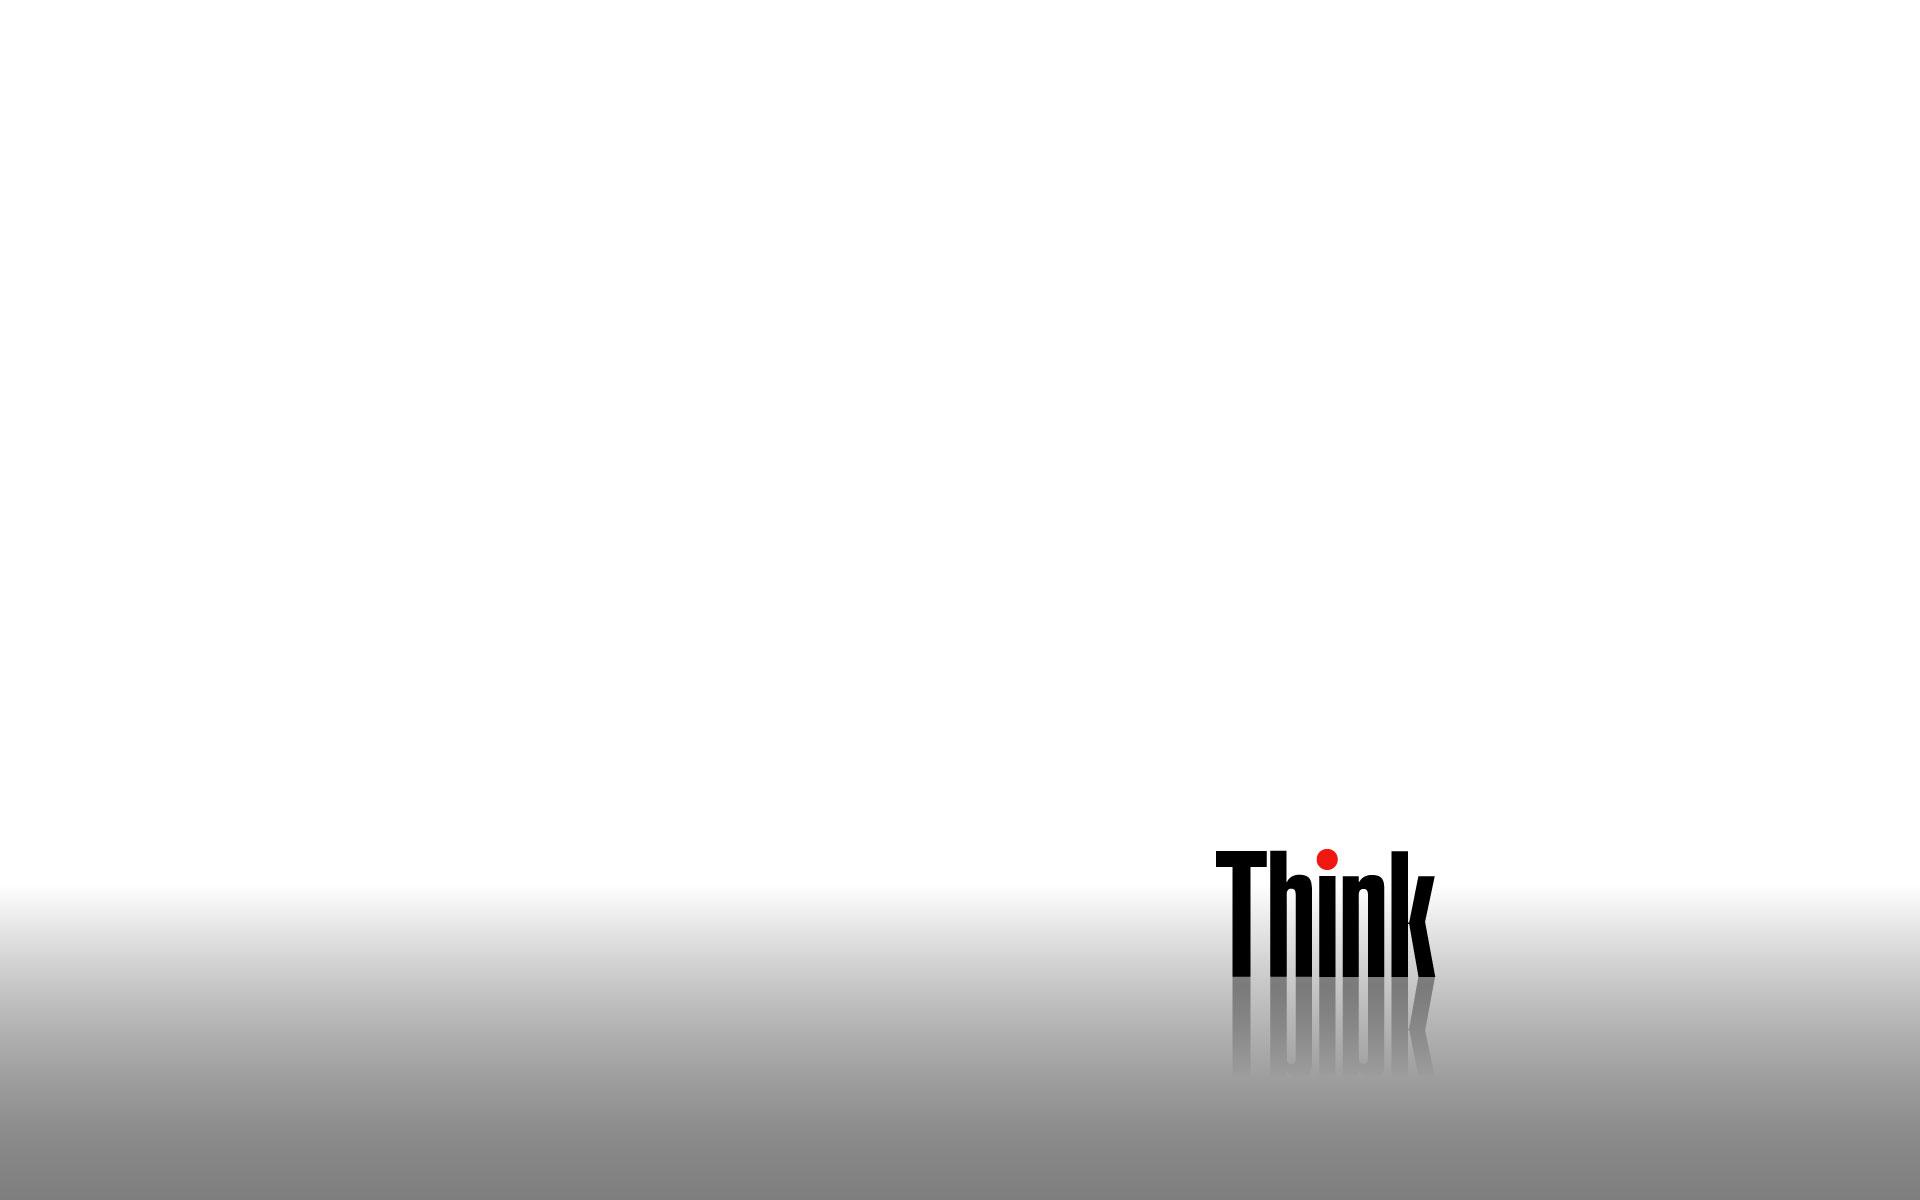 Lenovo Wallpaper Car: ThinkPad Wallpapers 1600x900